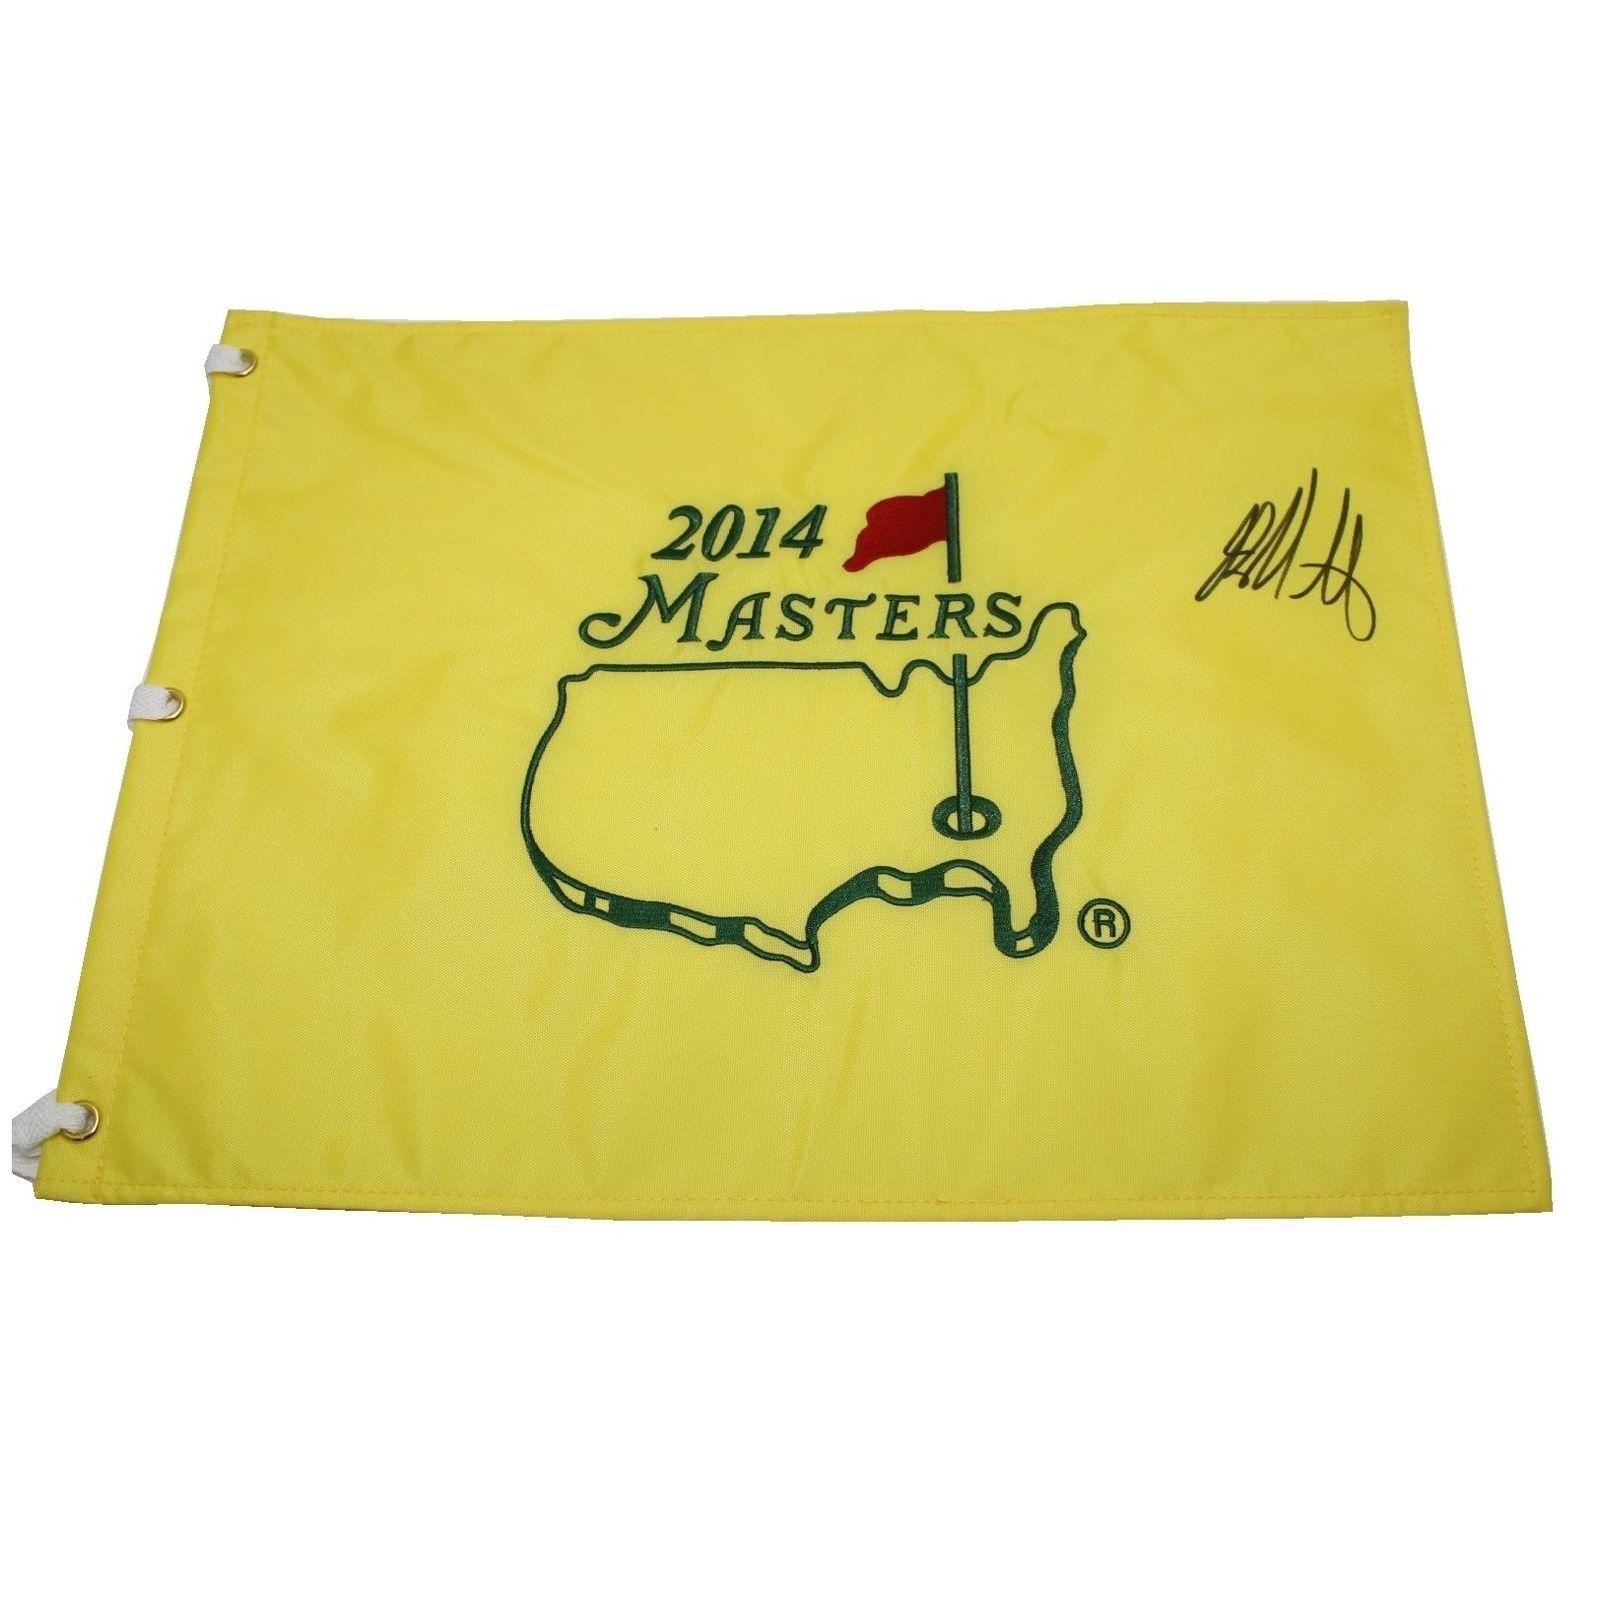 Bubba Watson Masters Flag - 9196a_lg.jpeg